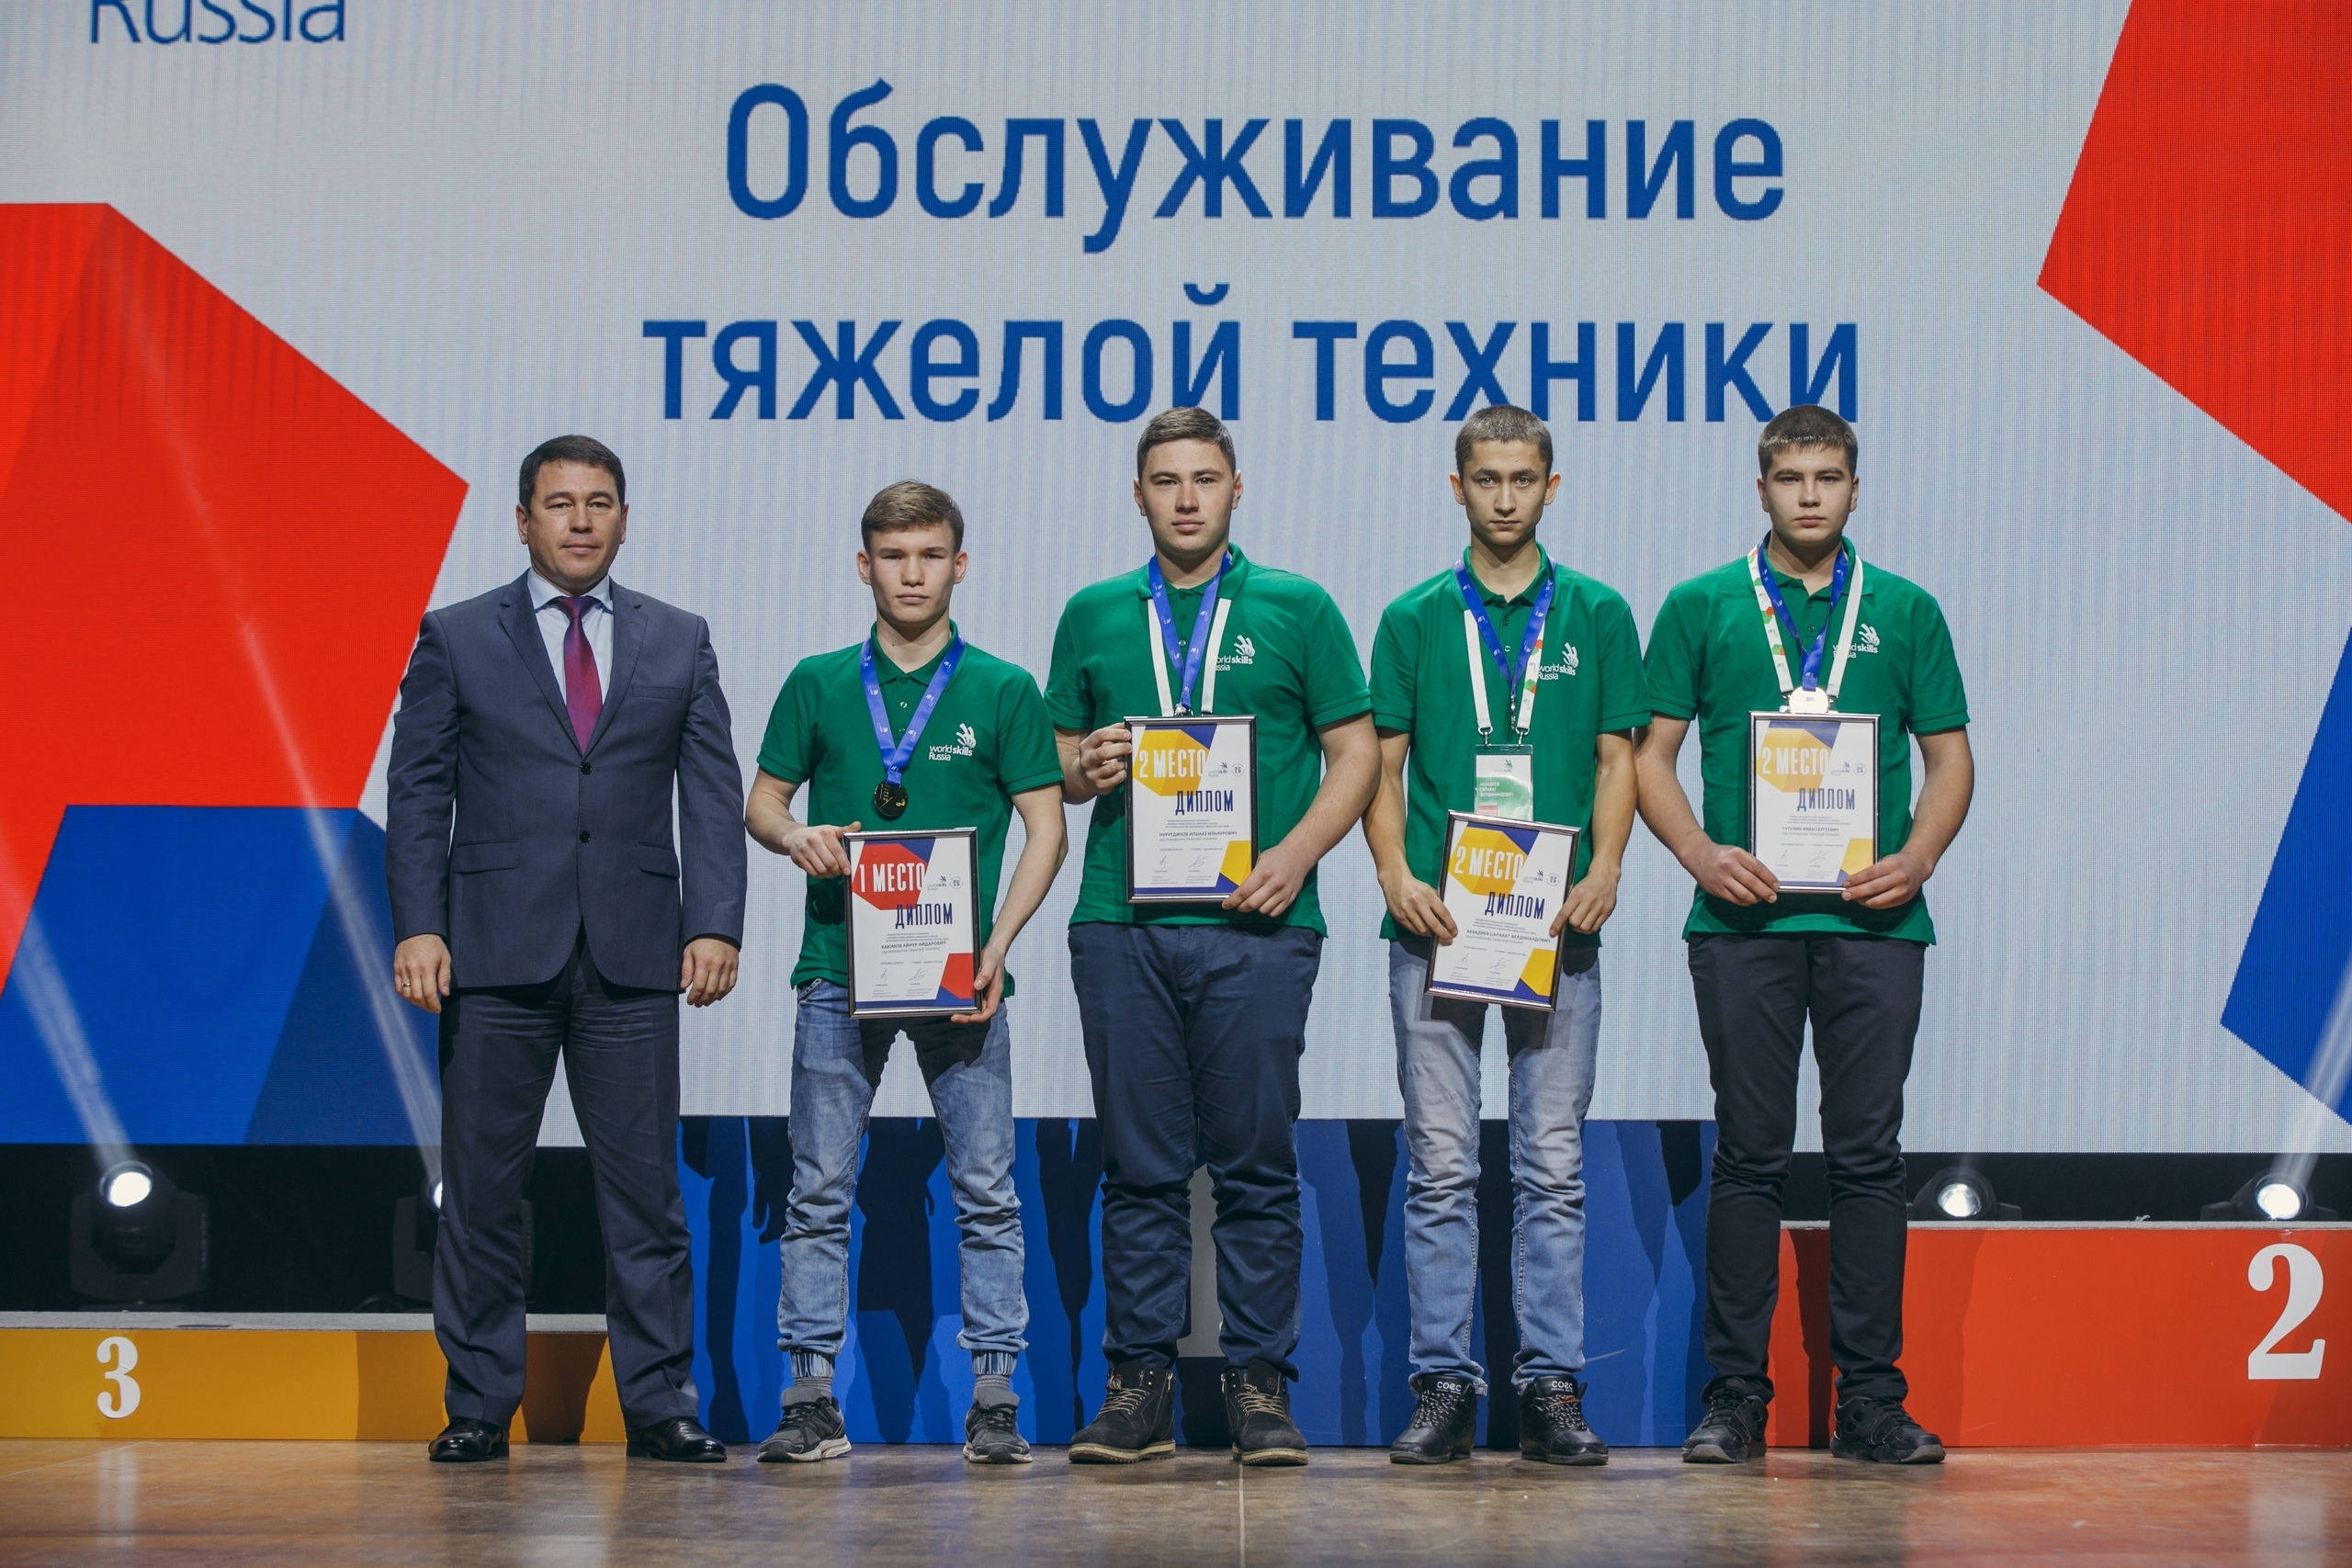 Региональный чемпионат Республики Татарстан «Молодые профессионалы» WorldSkills Russia 2019/2020